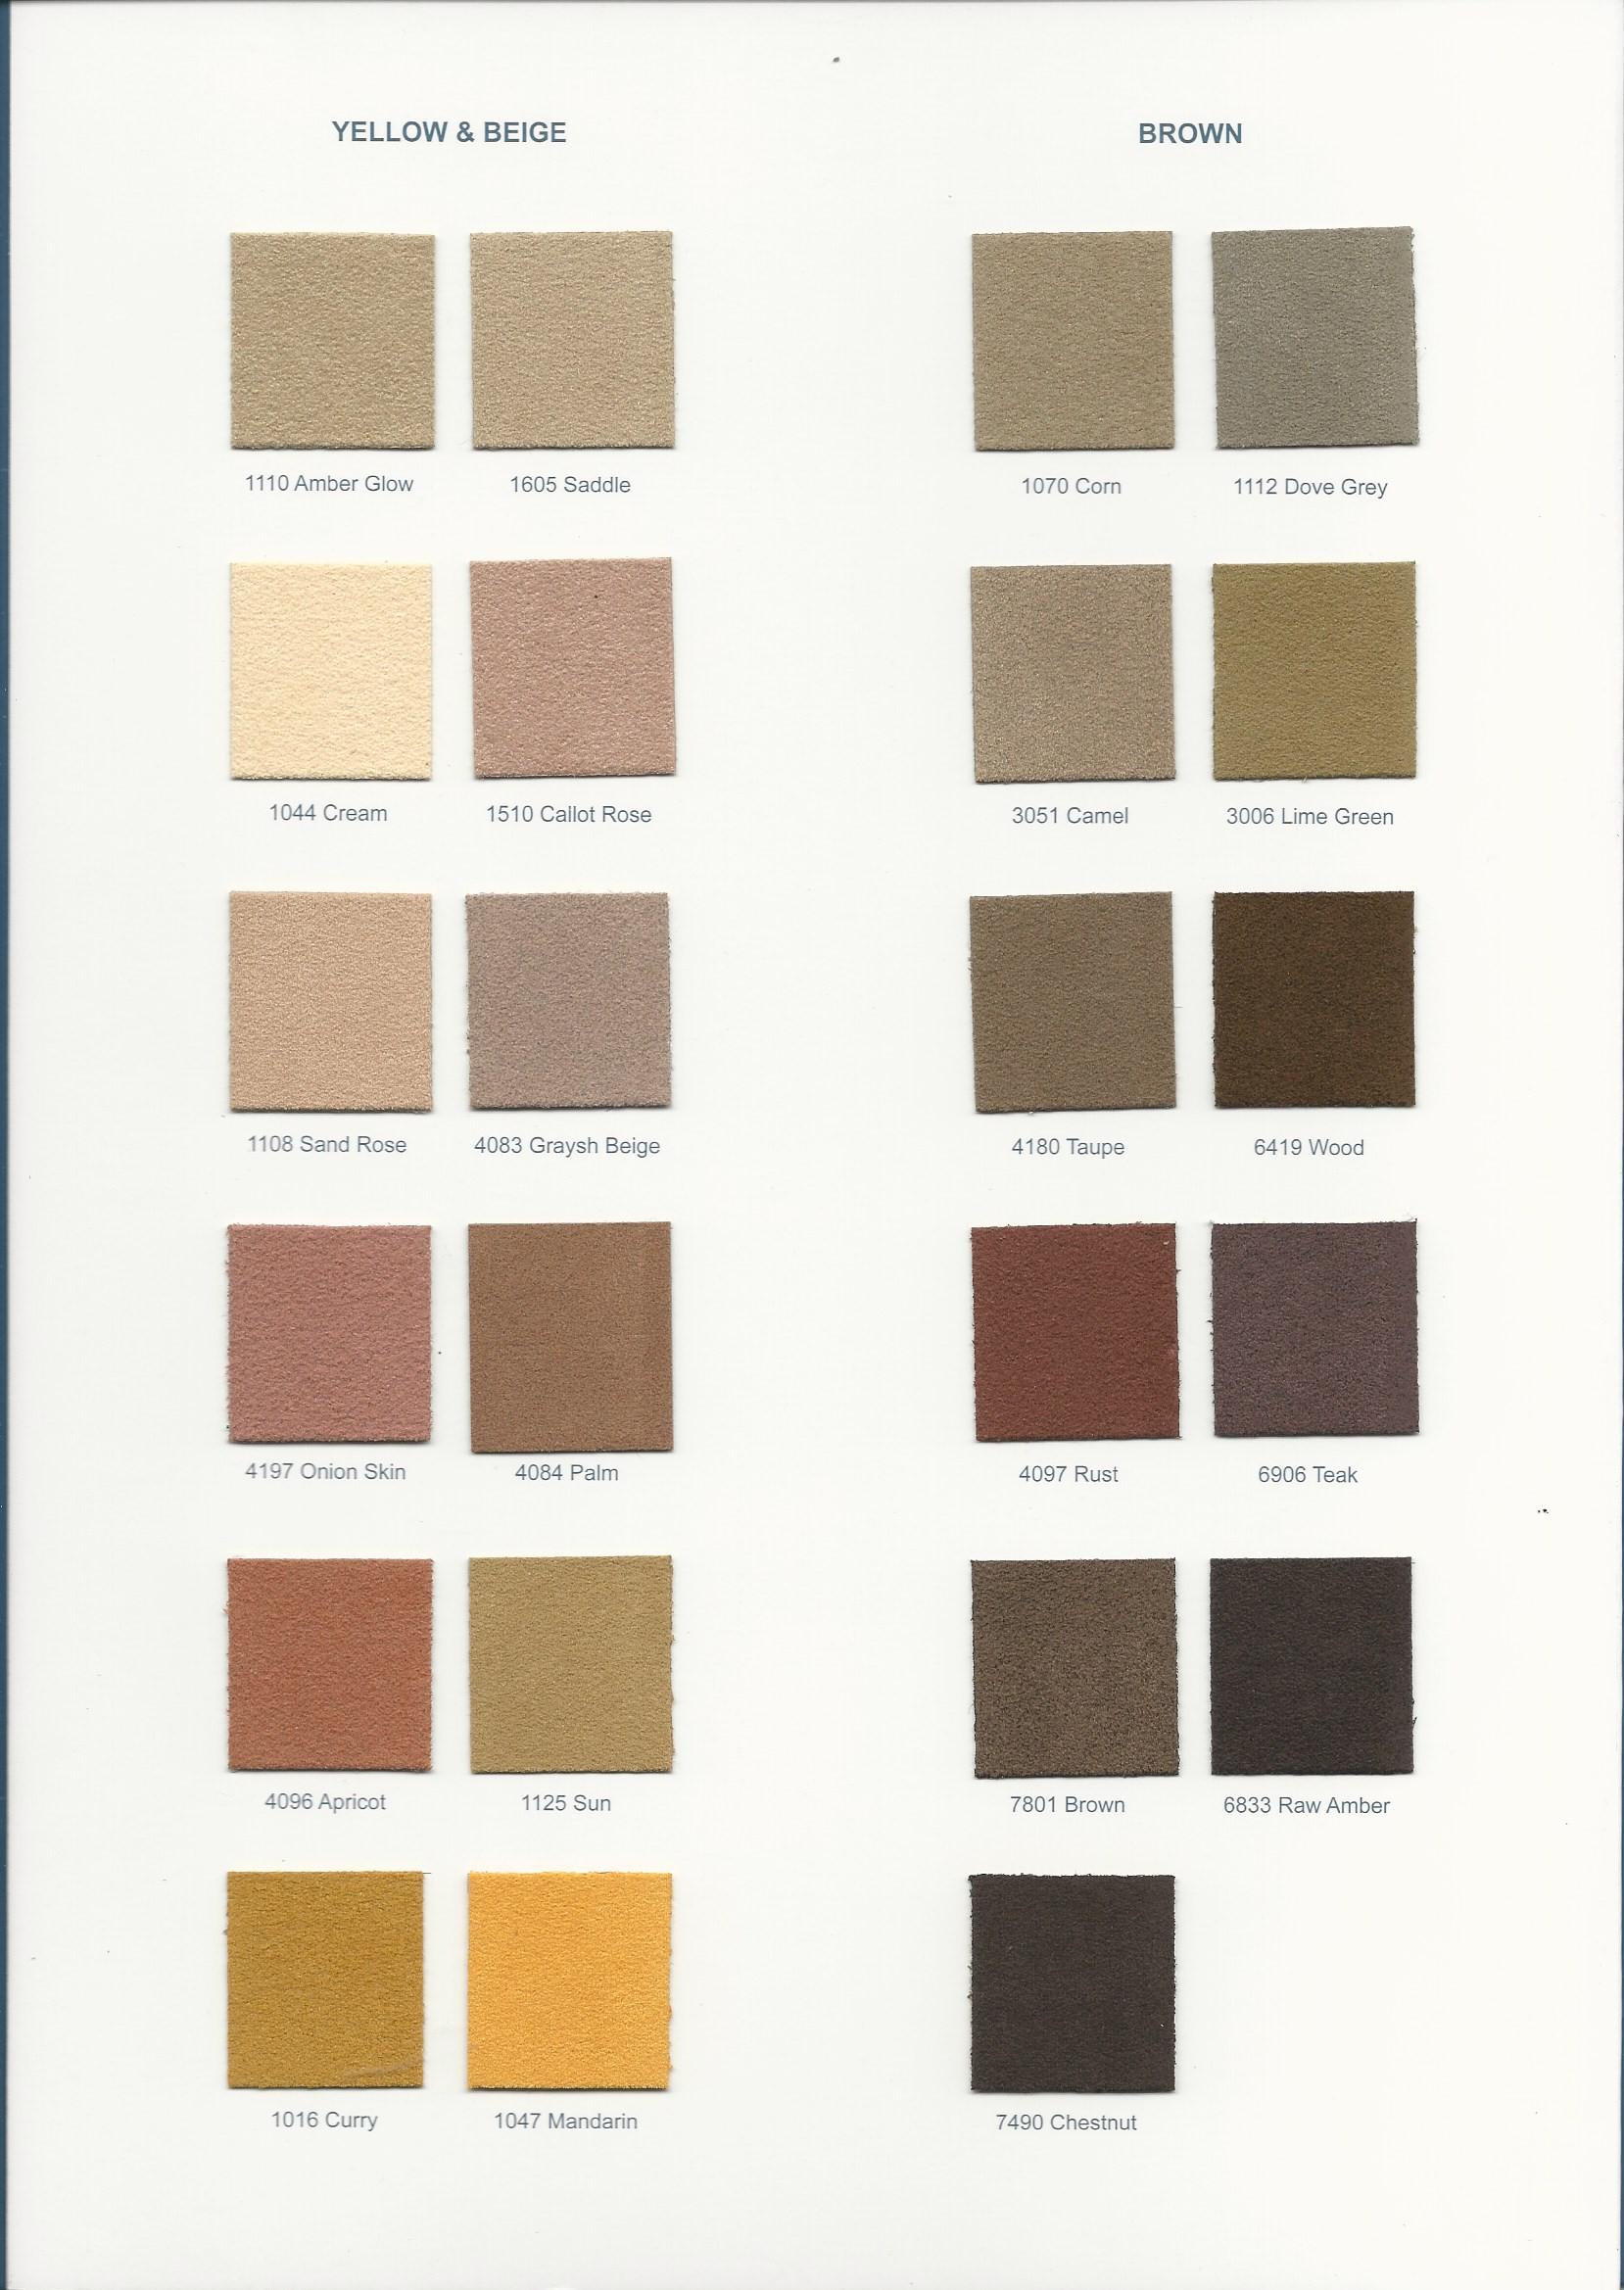 Bgv torino cartella colori tessuti arredo alcantara for Tessuti arredamento torino